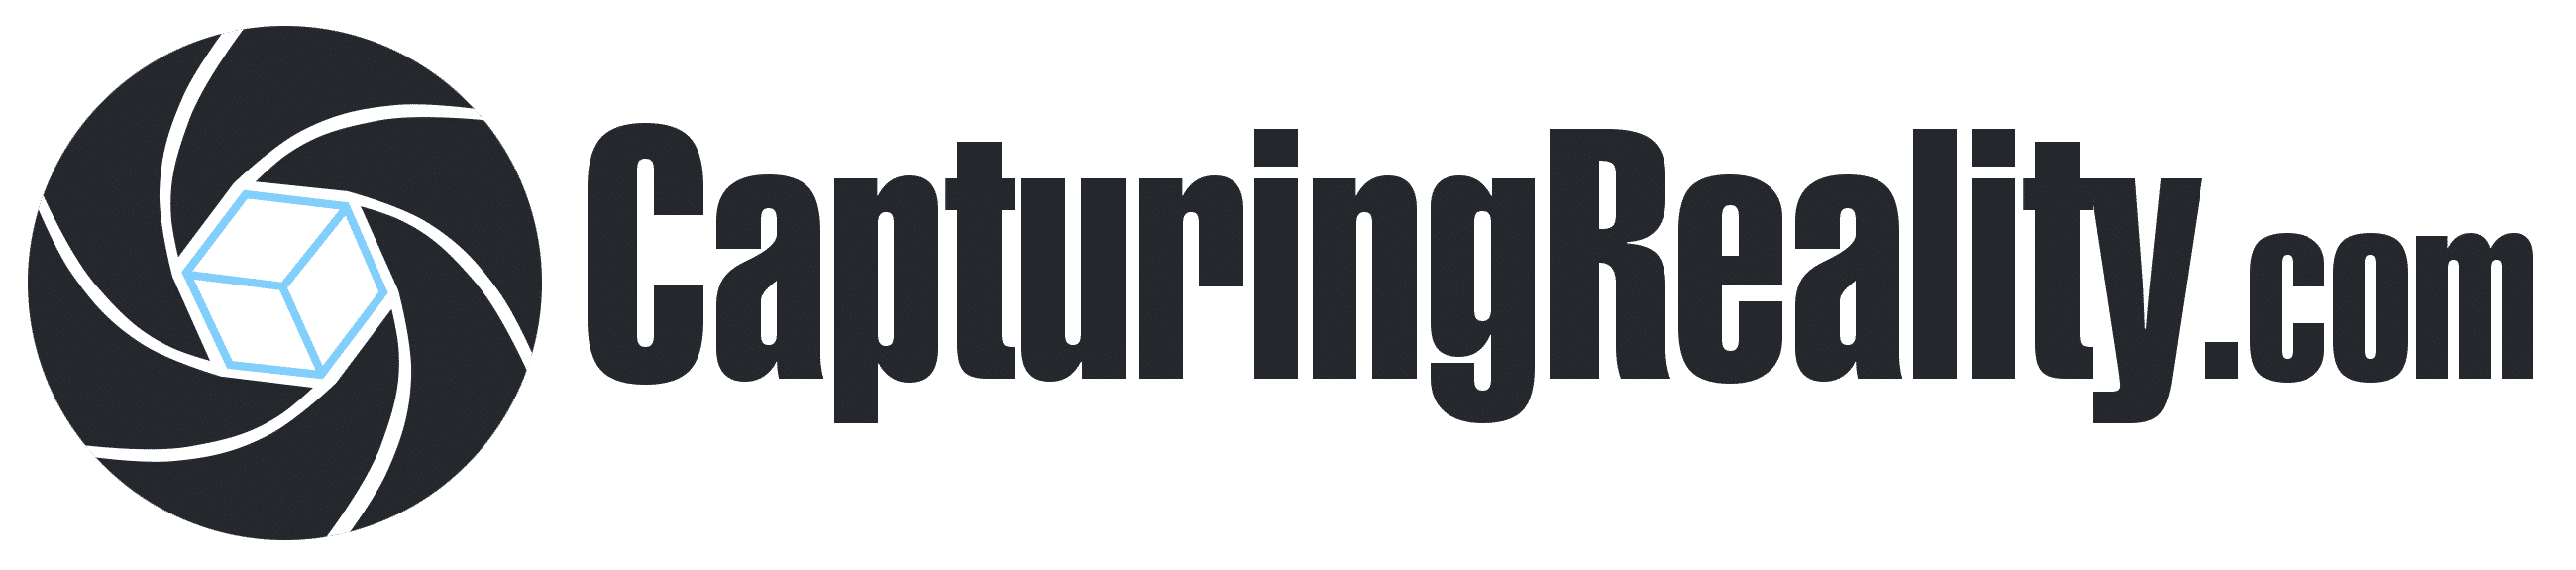 logo reality capture